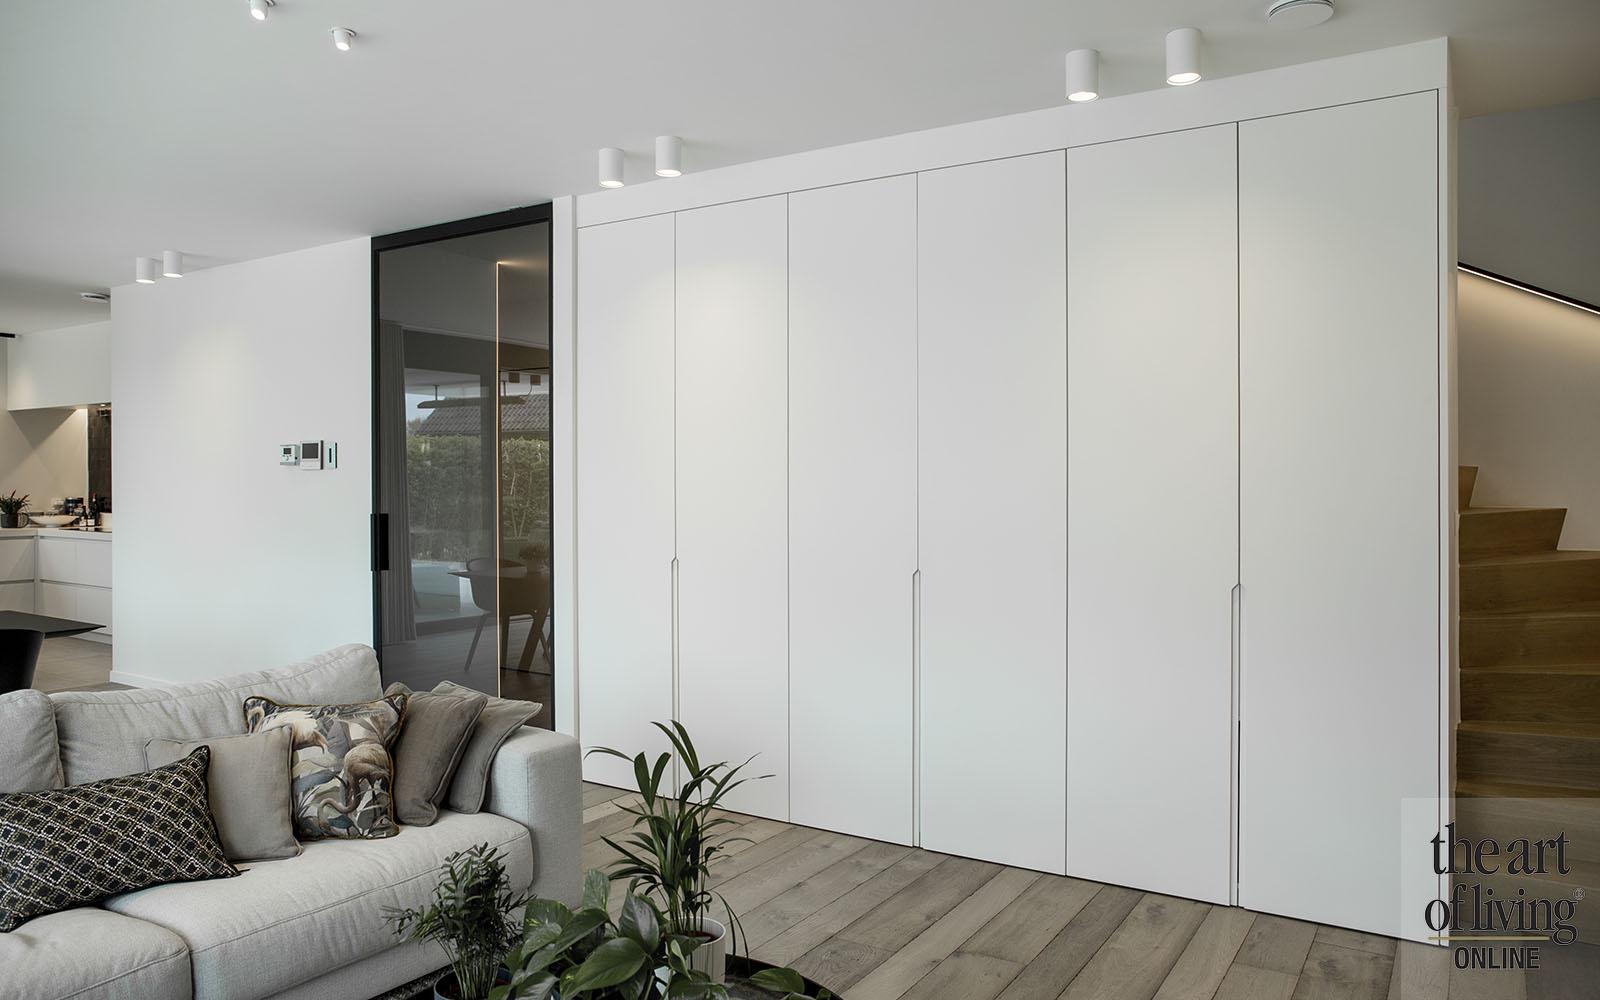 nieuwbouwwoning| Inarto Architecten, the art of living